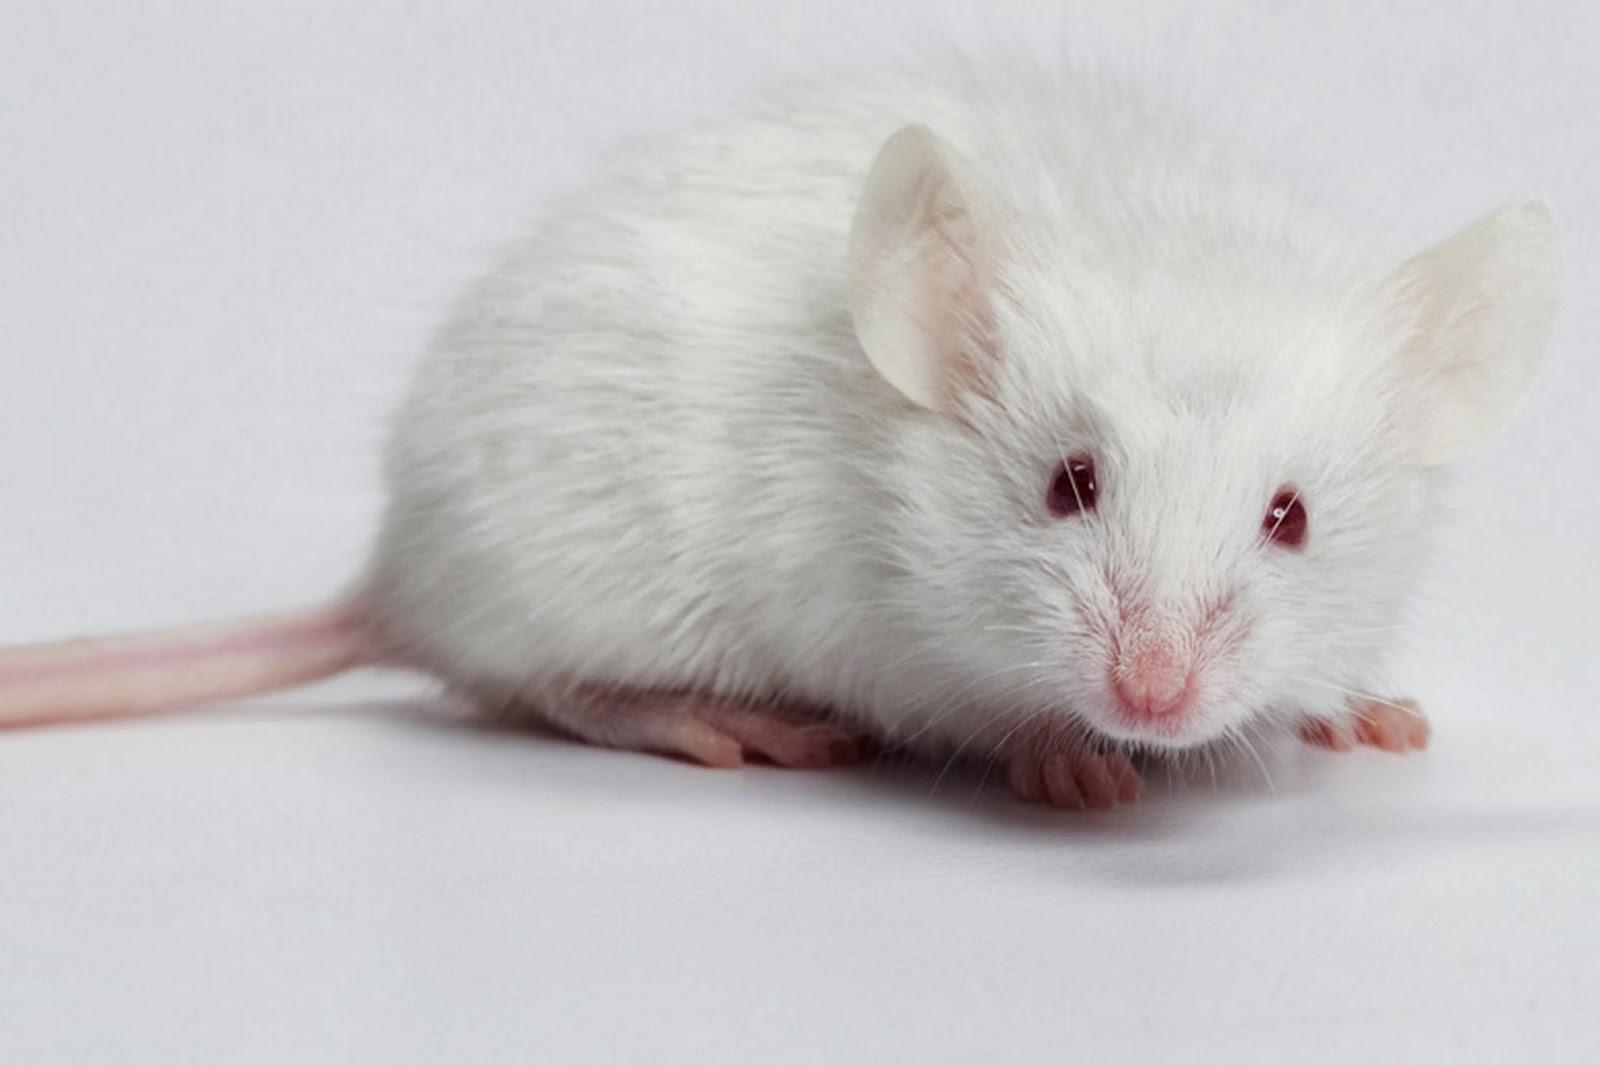 White mouse wallpaper - beautiful desktop wallpapers 2014